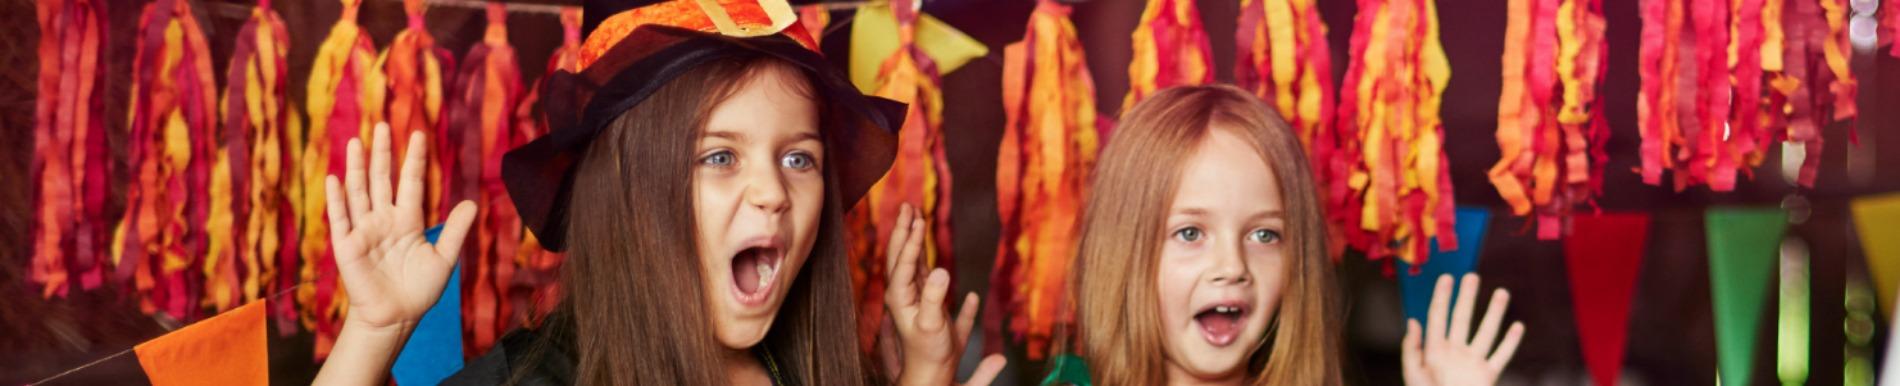 https://www.healthychildren.org/SiteCollectionImage-Homepage-Banners/HalloweenScare_Girls.jpg